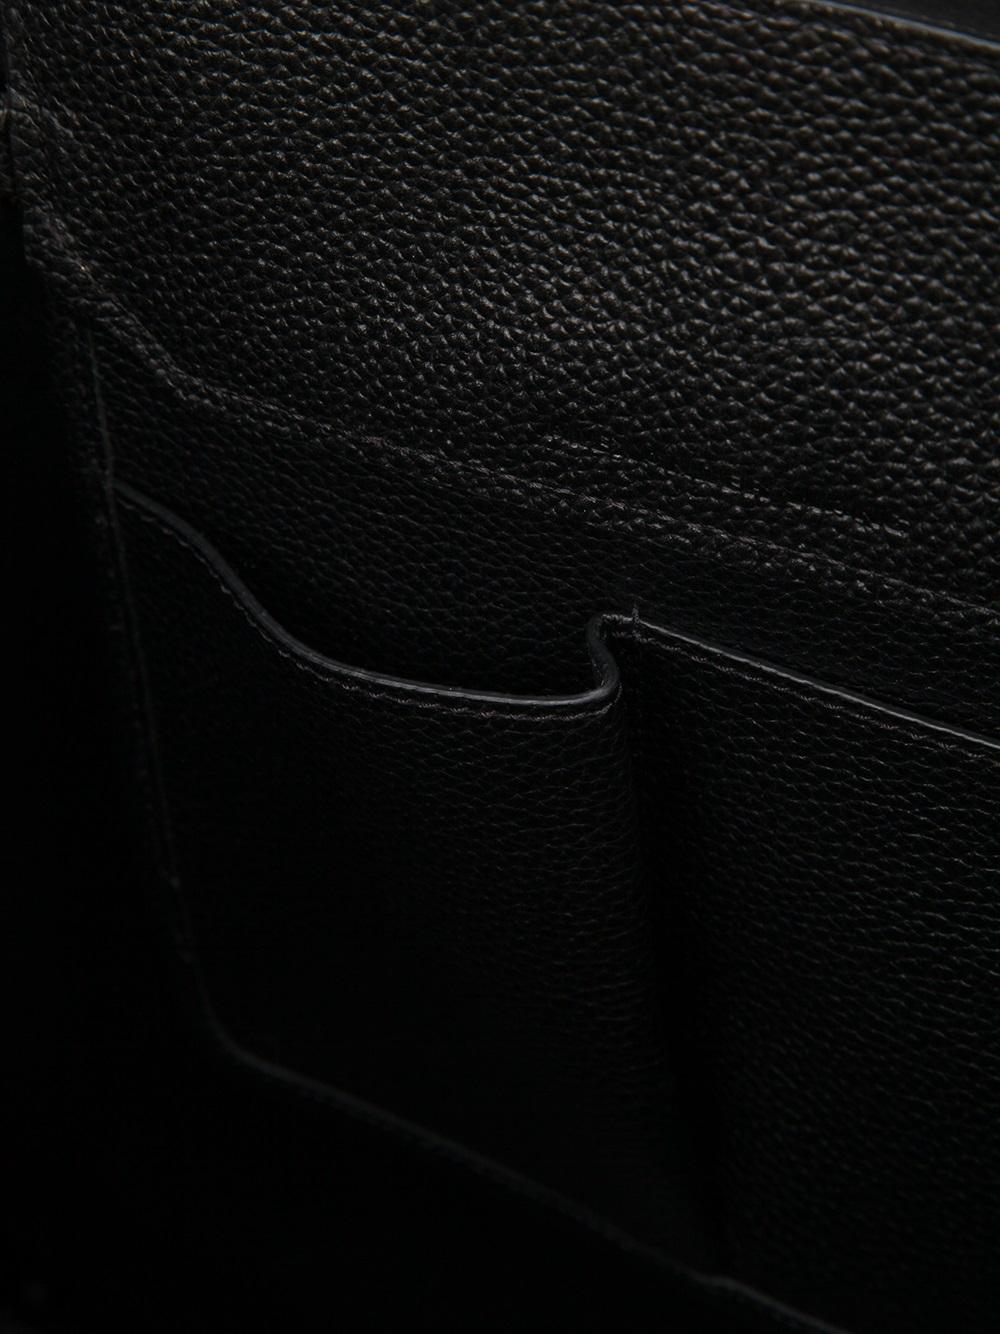 Alexander Wang Prisma Shopper Tote in Black